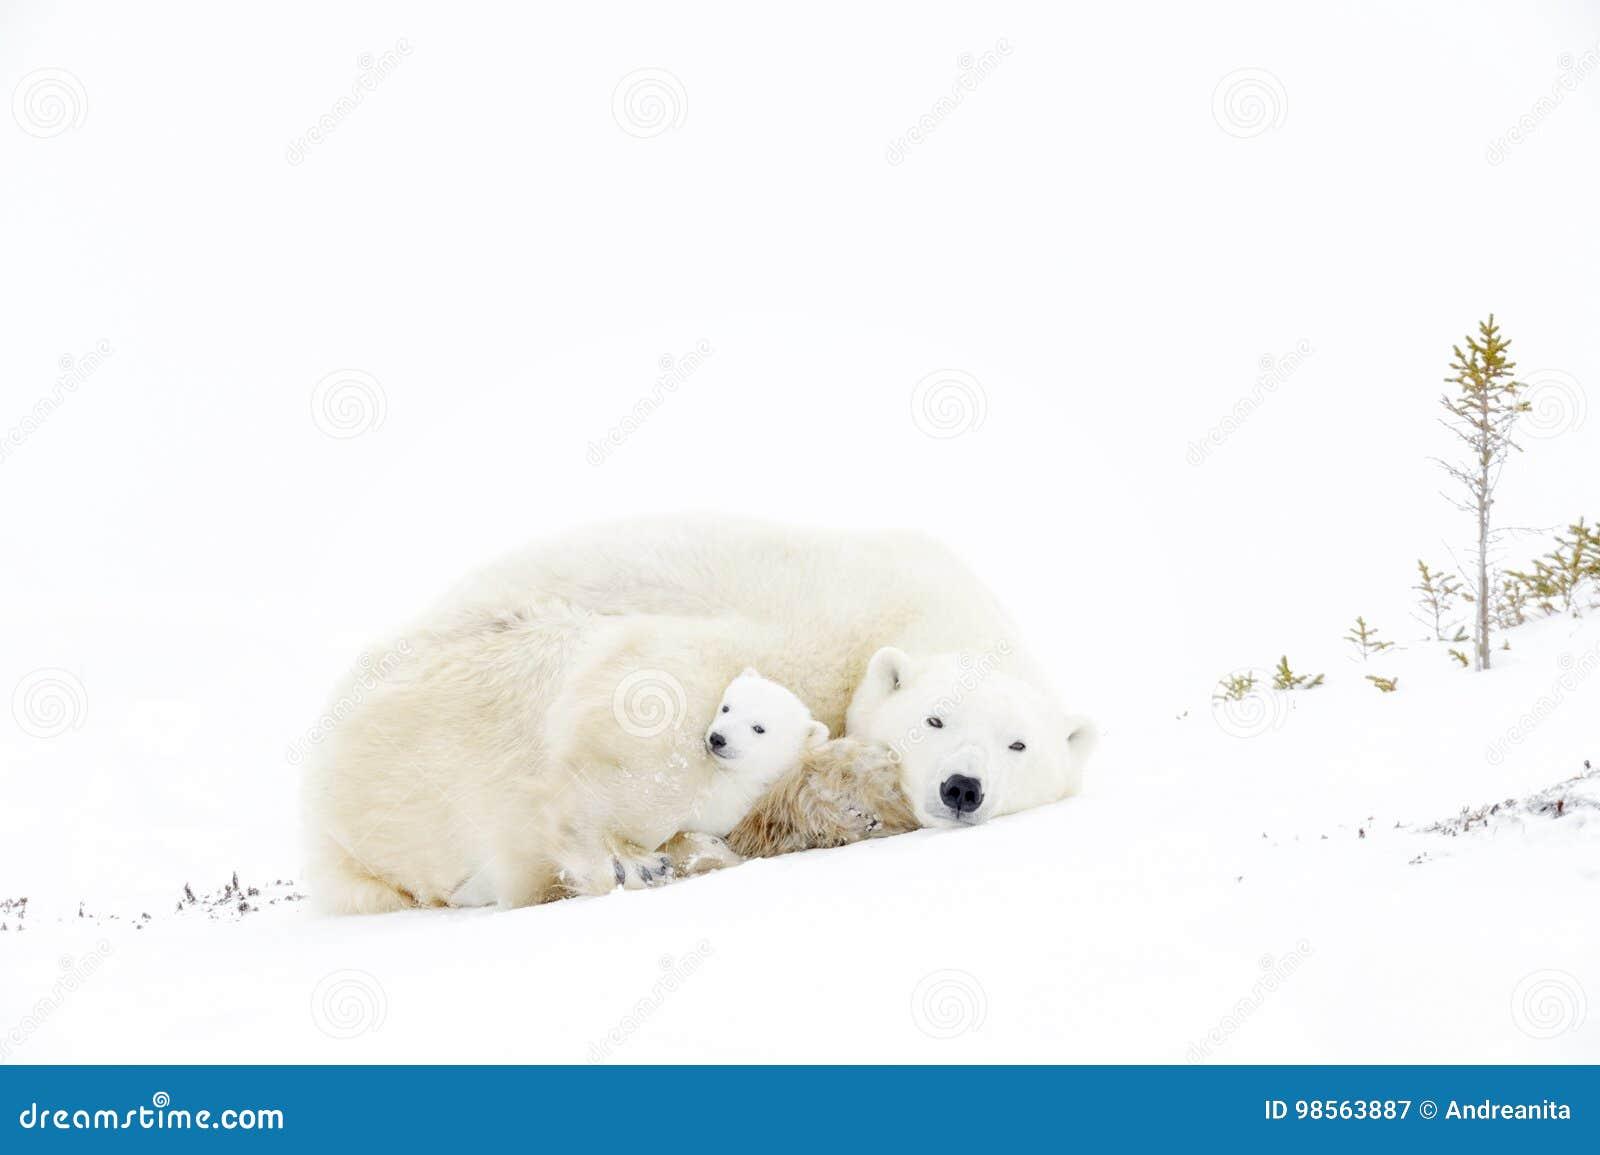 Two bears having enjoyment